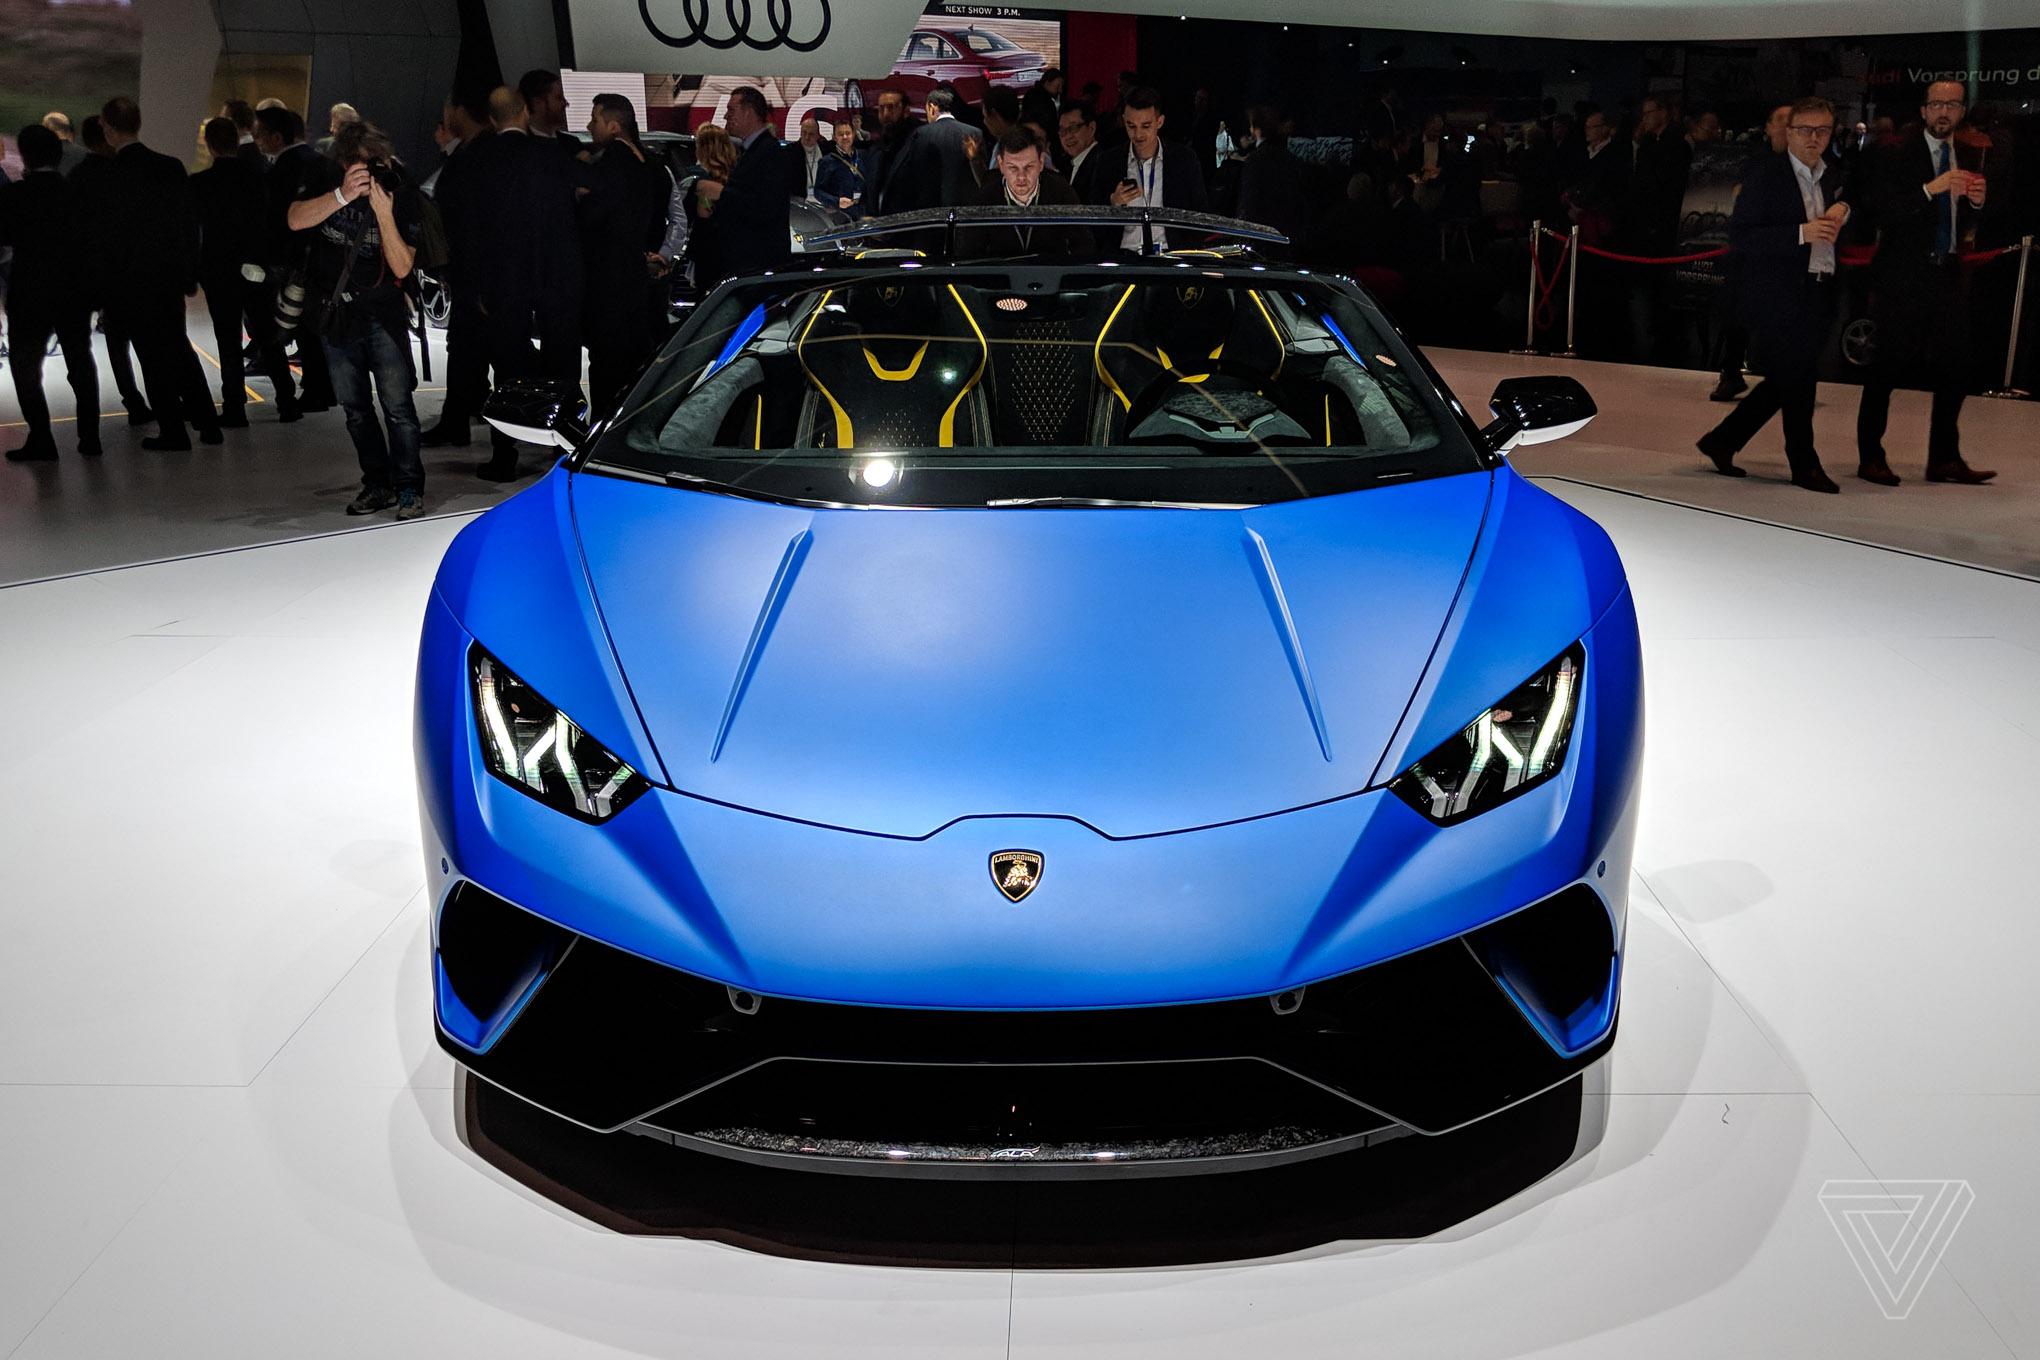 Lamborghini   The Verge On Lamborghini Countach, Lamborghini On Fire,  Lamborghini Diablo, ...